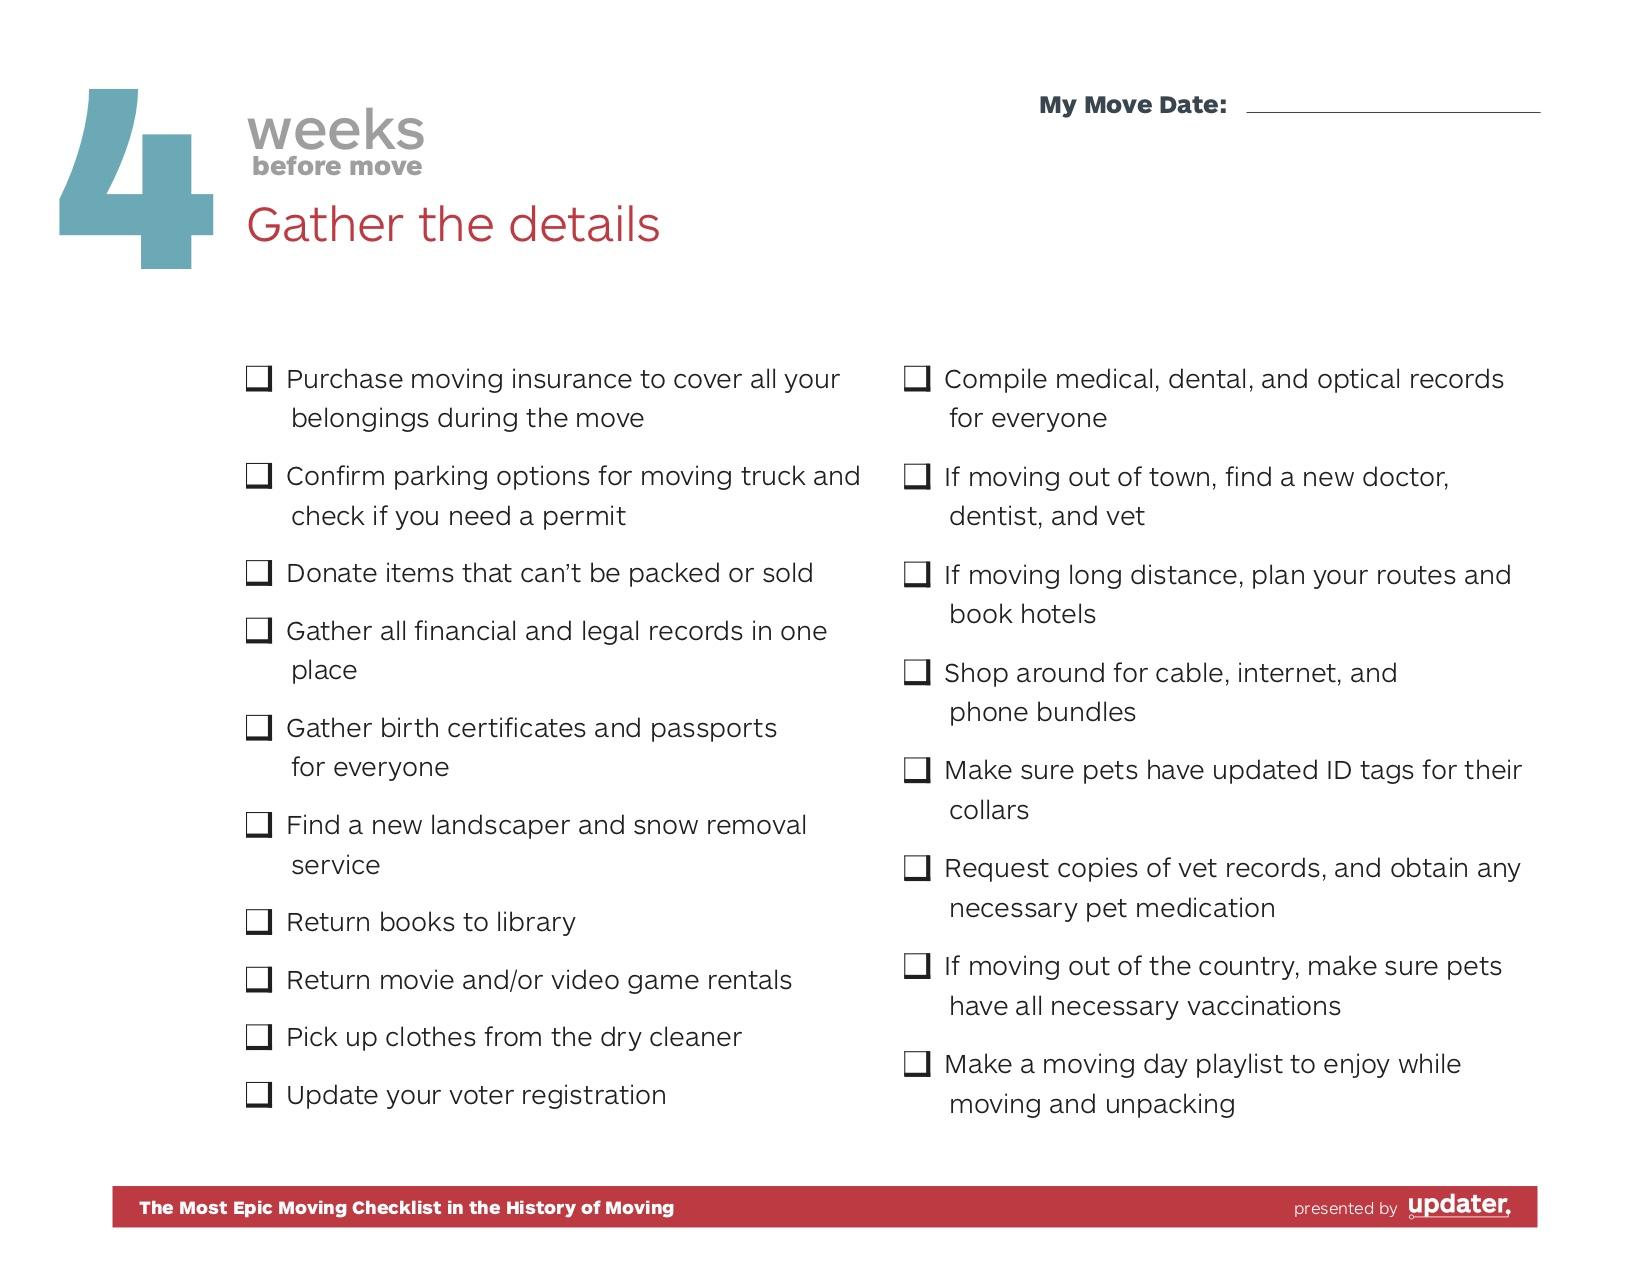 moving-checklist-4wks.jpg